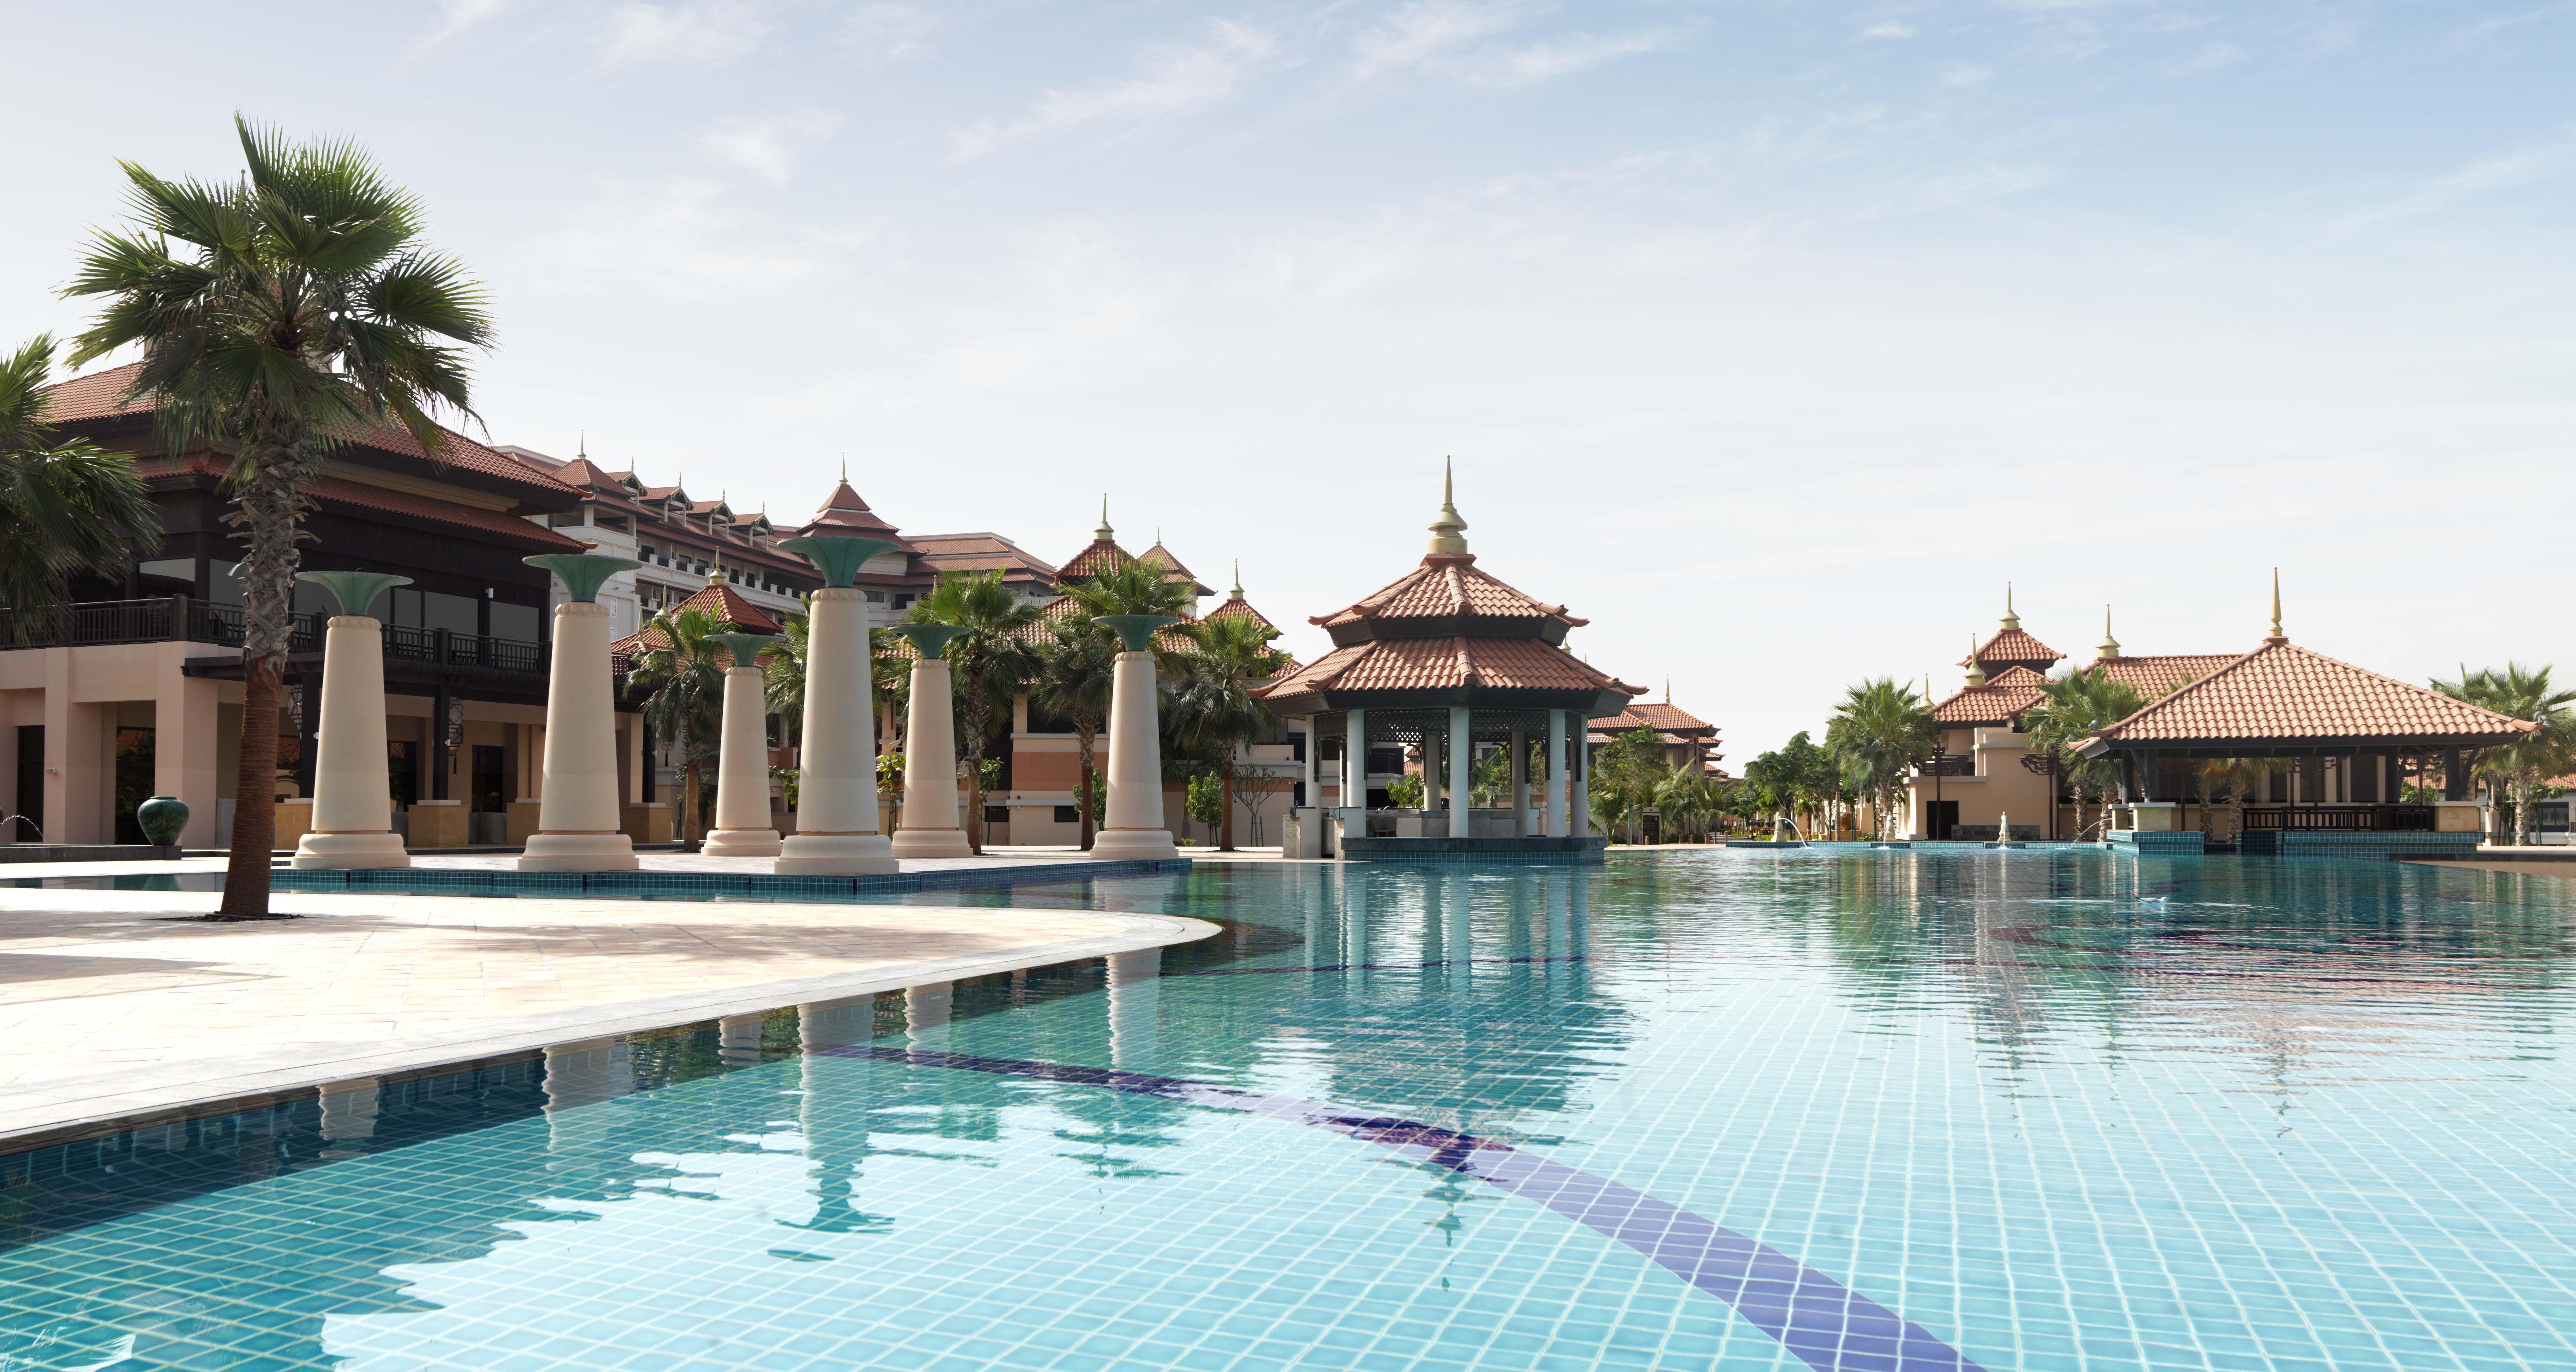 anantara-the-palm-dubai-thai-style